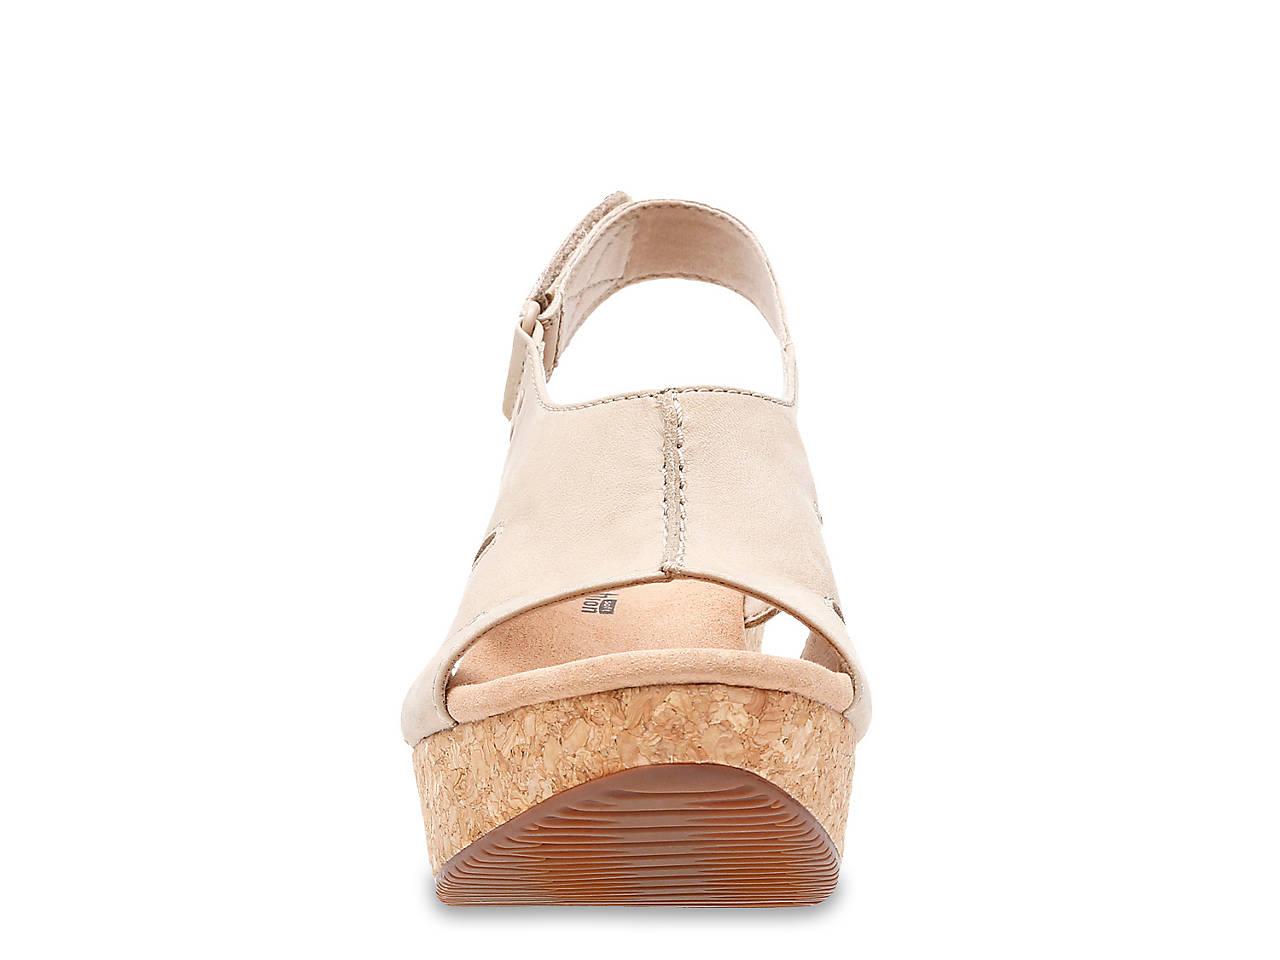 7656a829188 Clarks Annadel Bari Wedge Sandal Women s Shoes